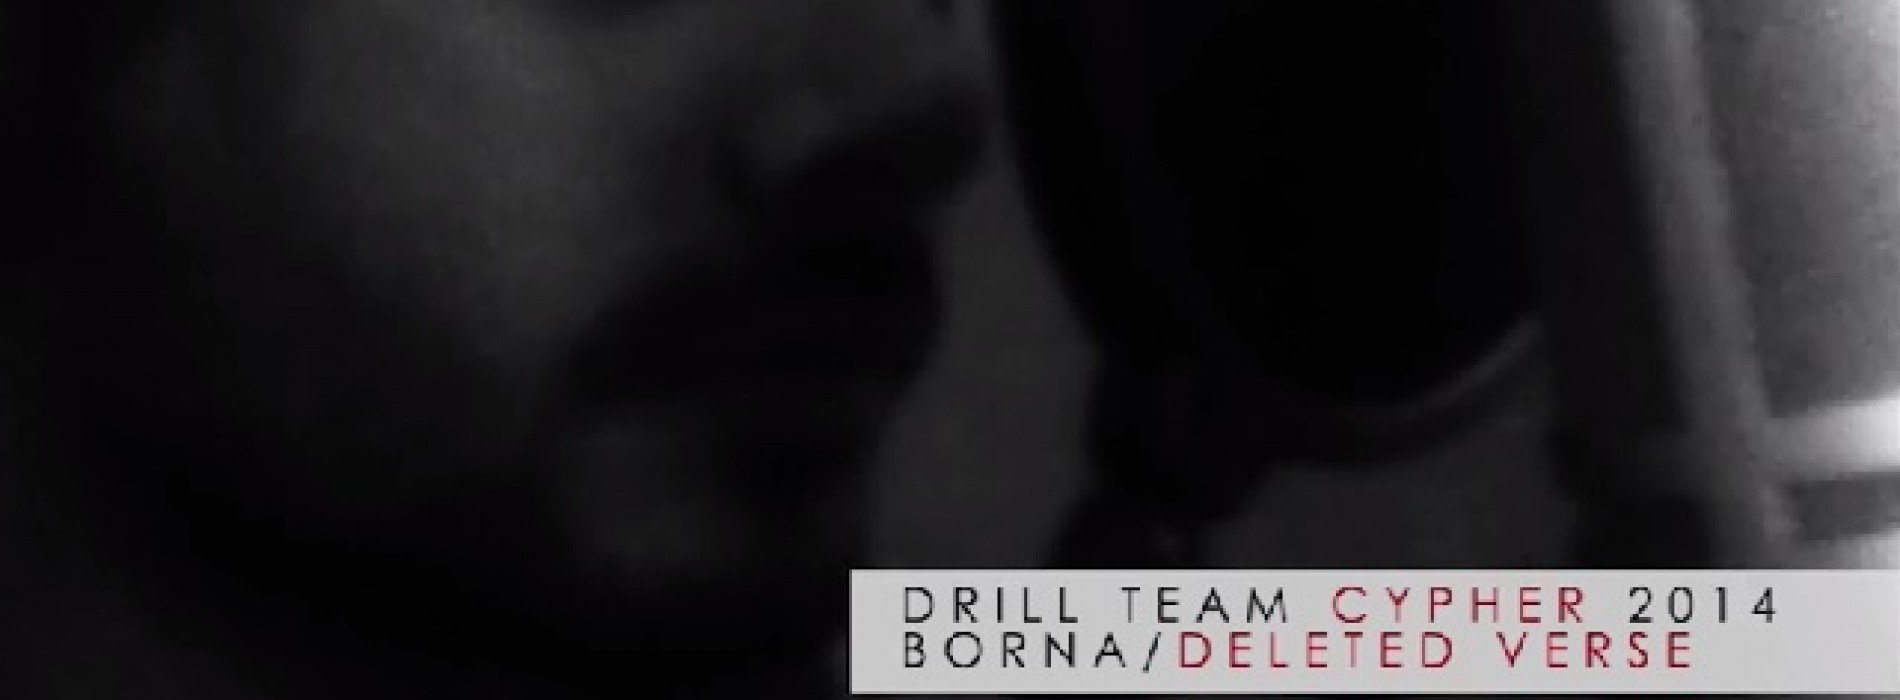 Drill Team Cyhper 14 – Deleted Verse